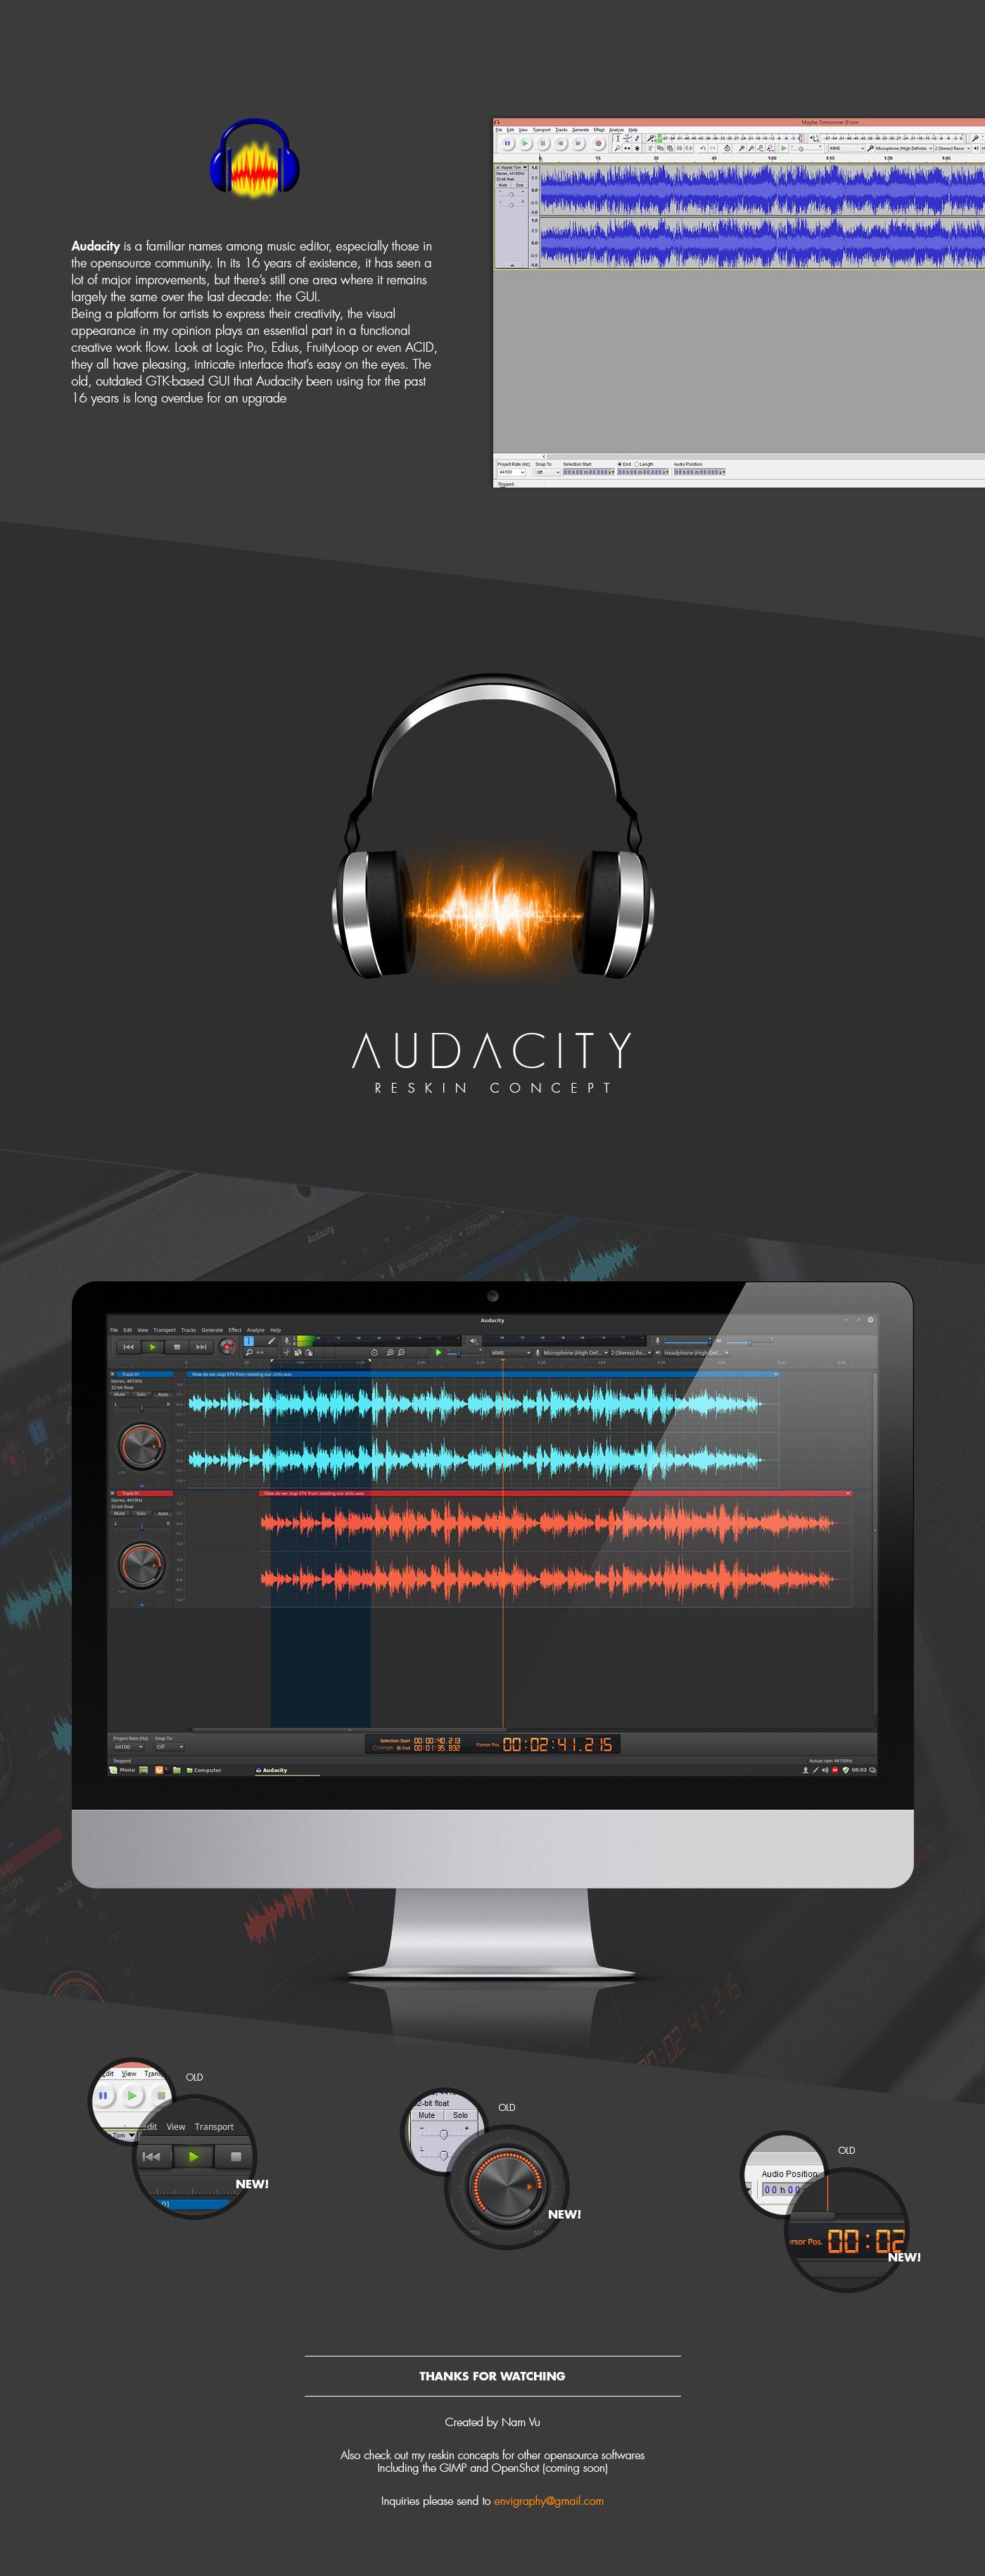 Audacity Interface Redesign